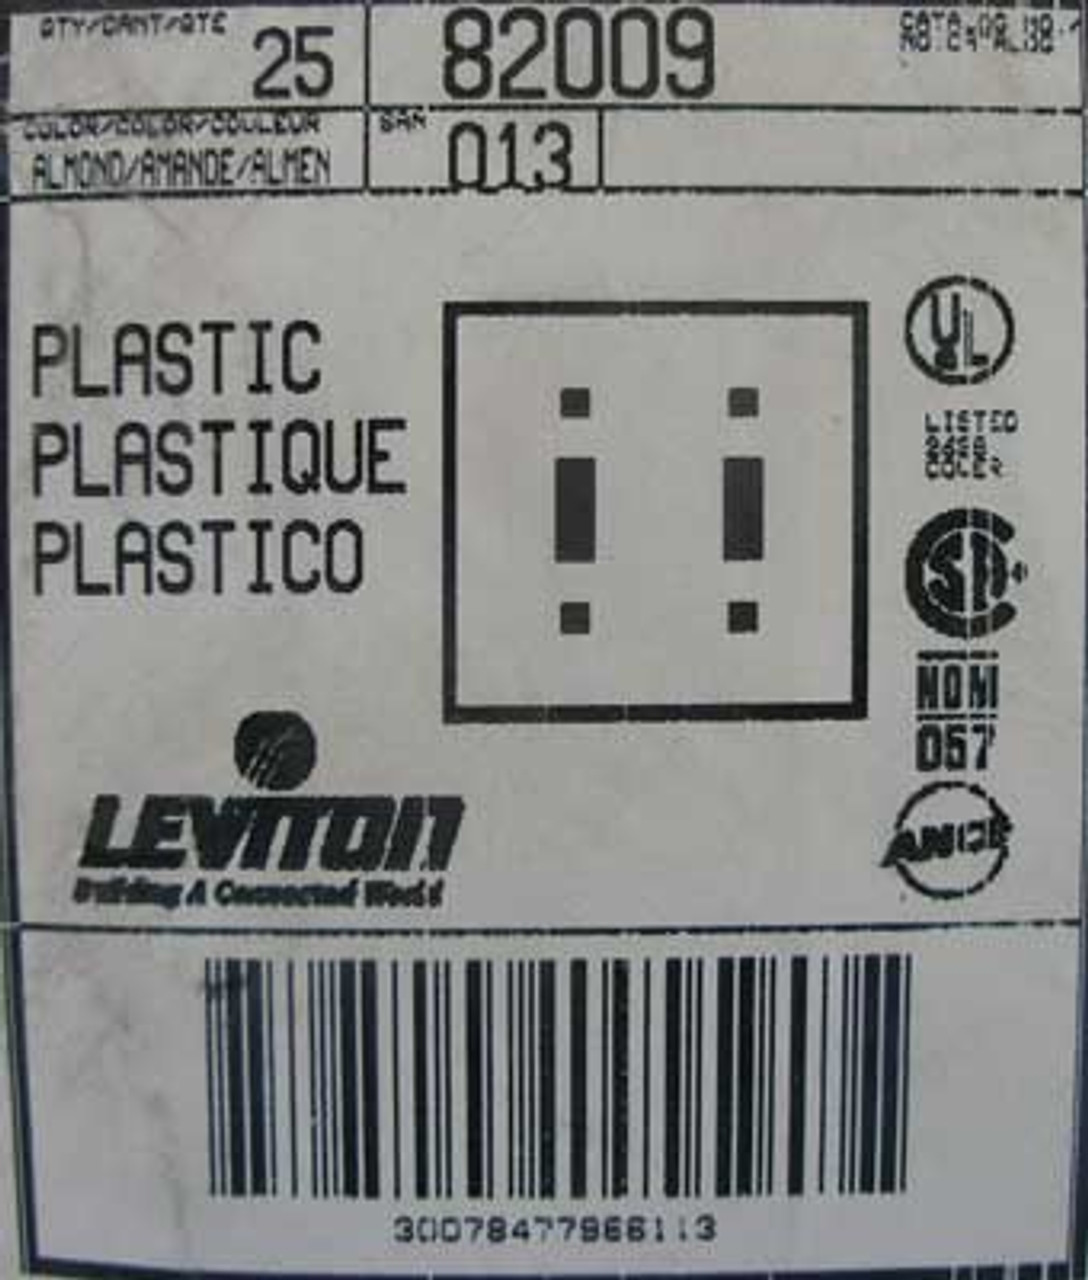 Leviton 82009 2-gang Toggle Wall Plate Almond (Lot of 25)